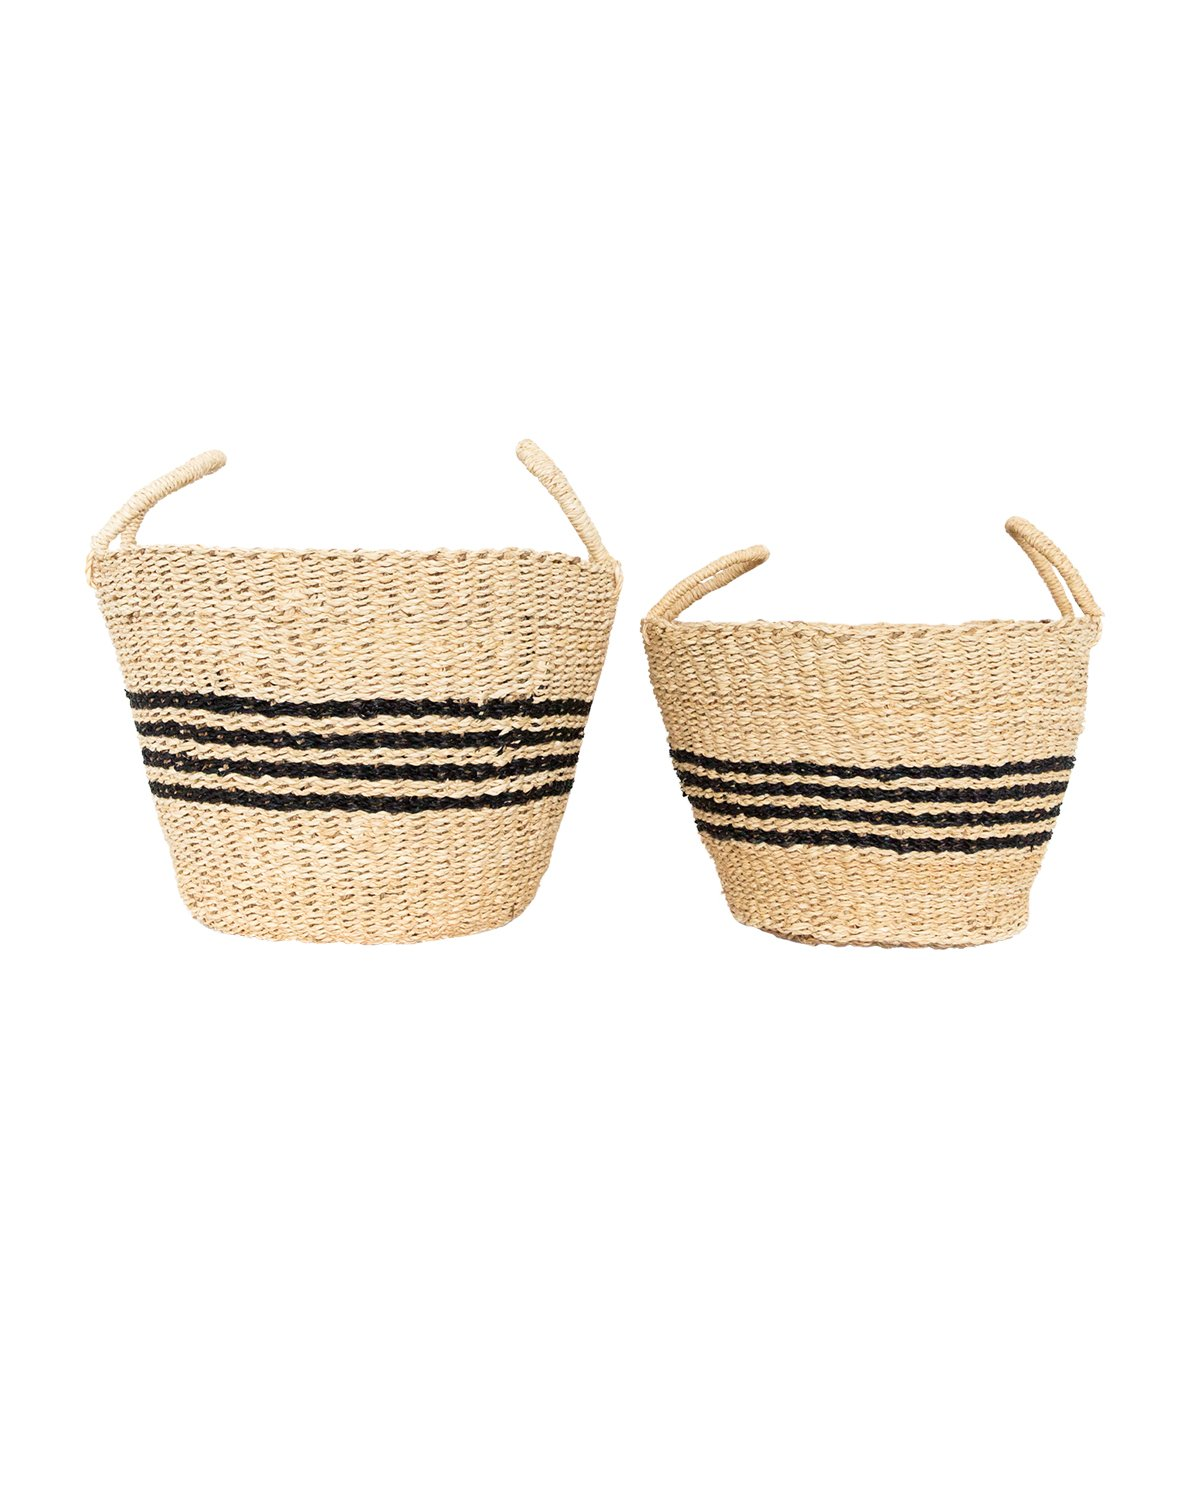 Striped_Palm_Baskets3.jpg